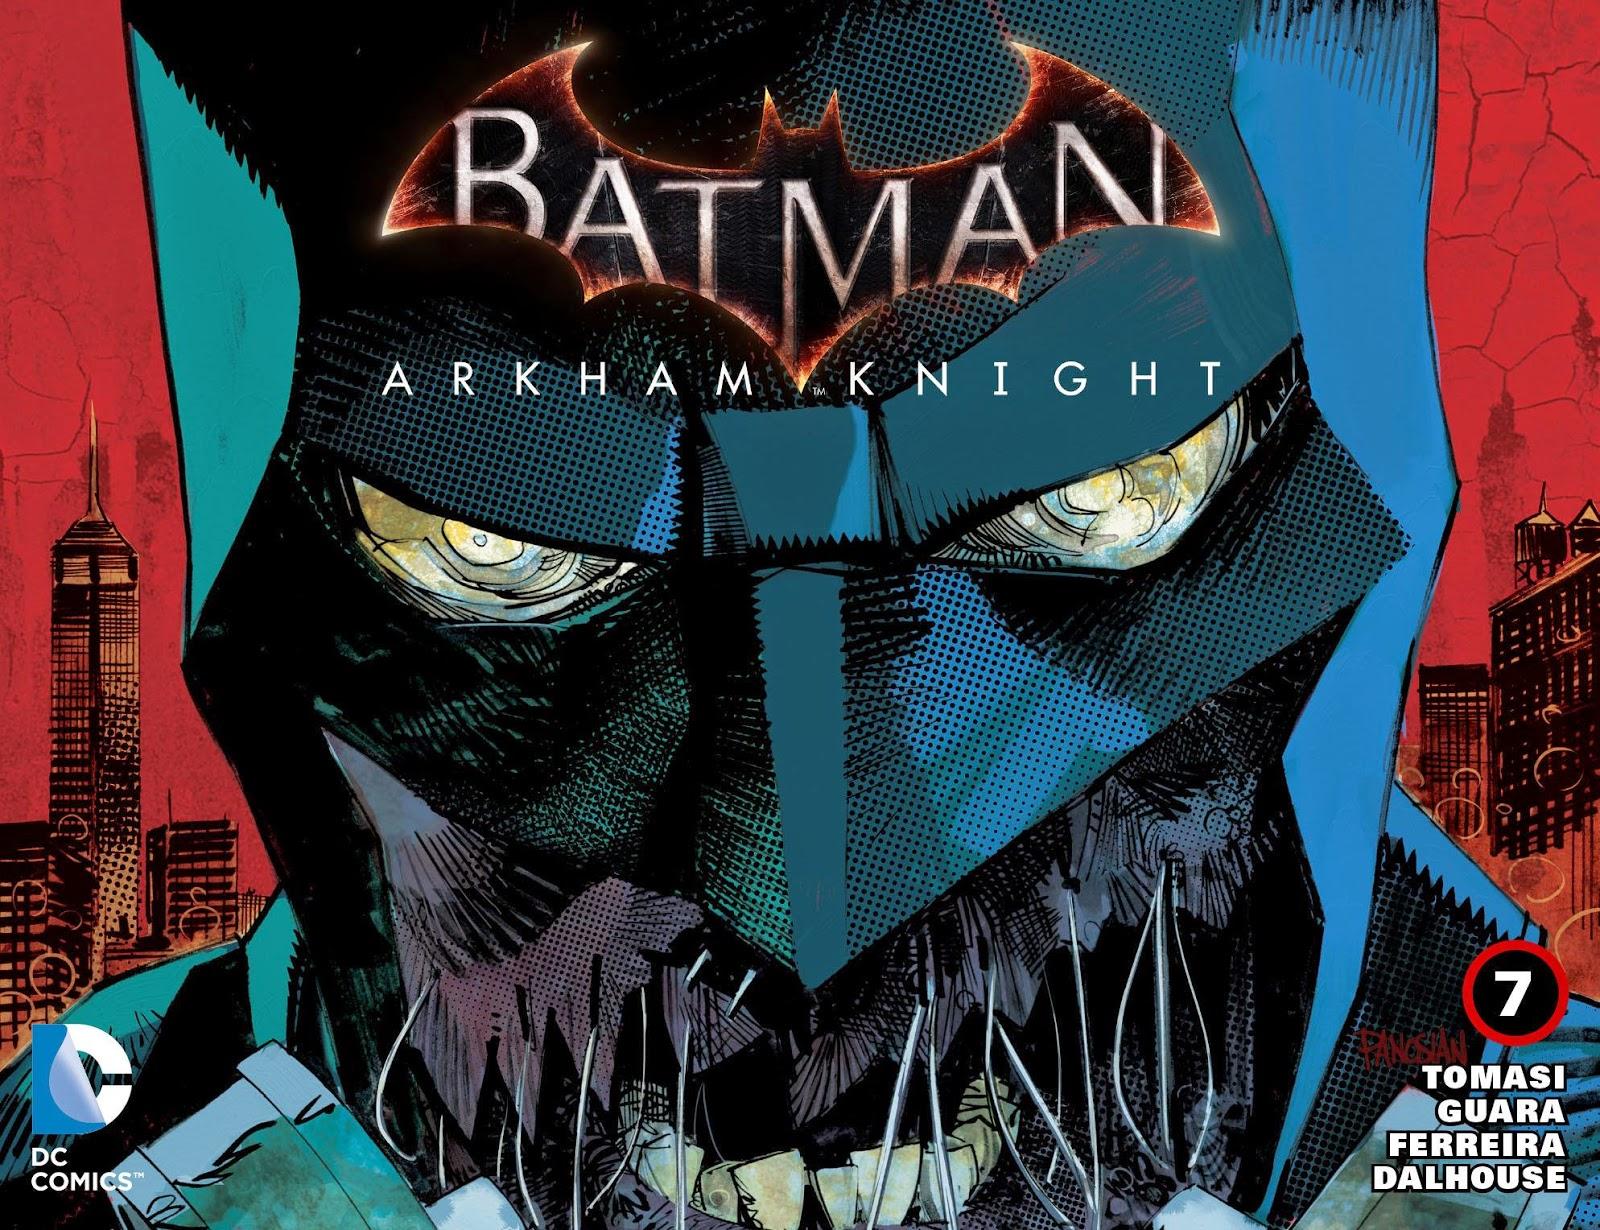 Batman Arkham Knight #7 2015 DC Comics